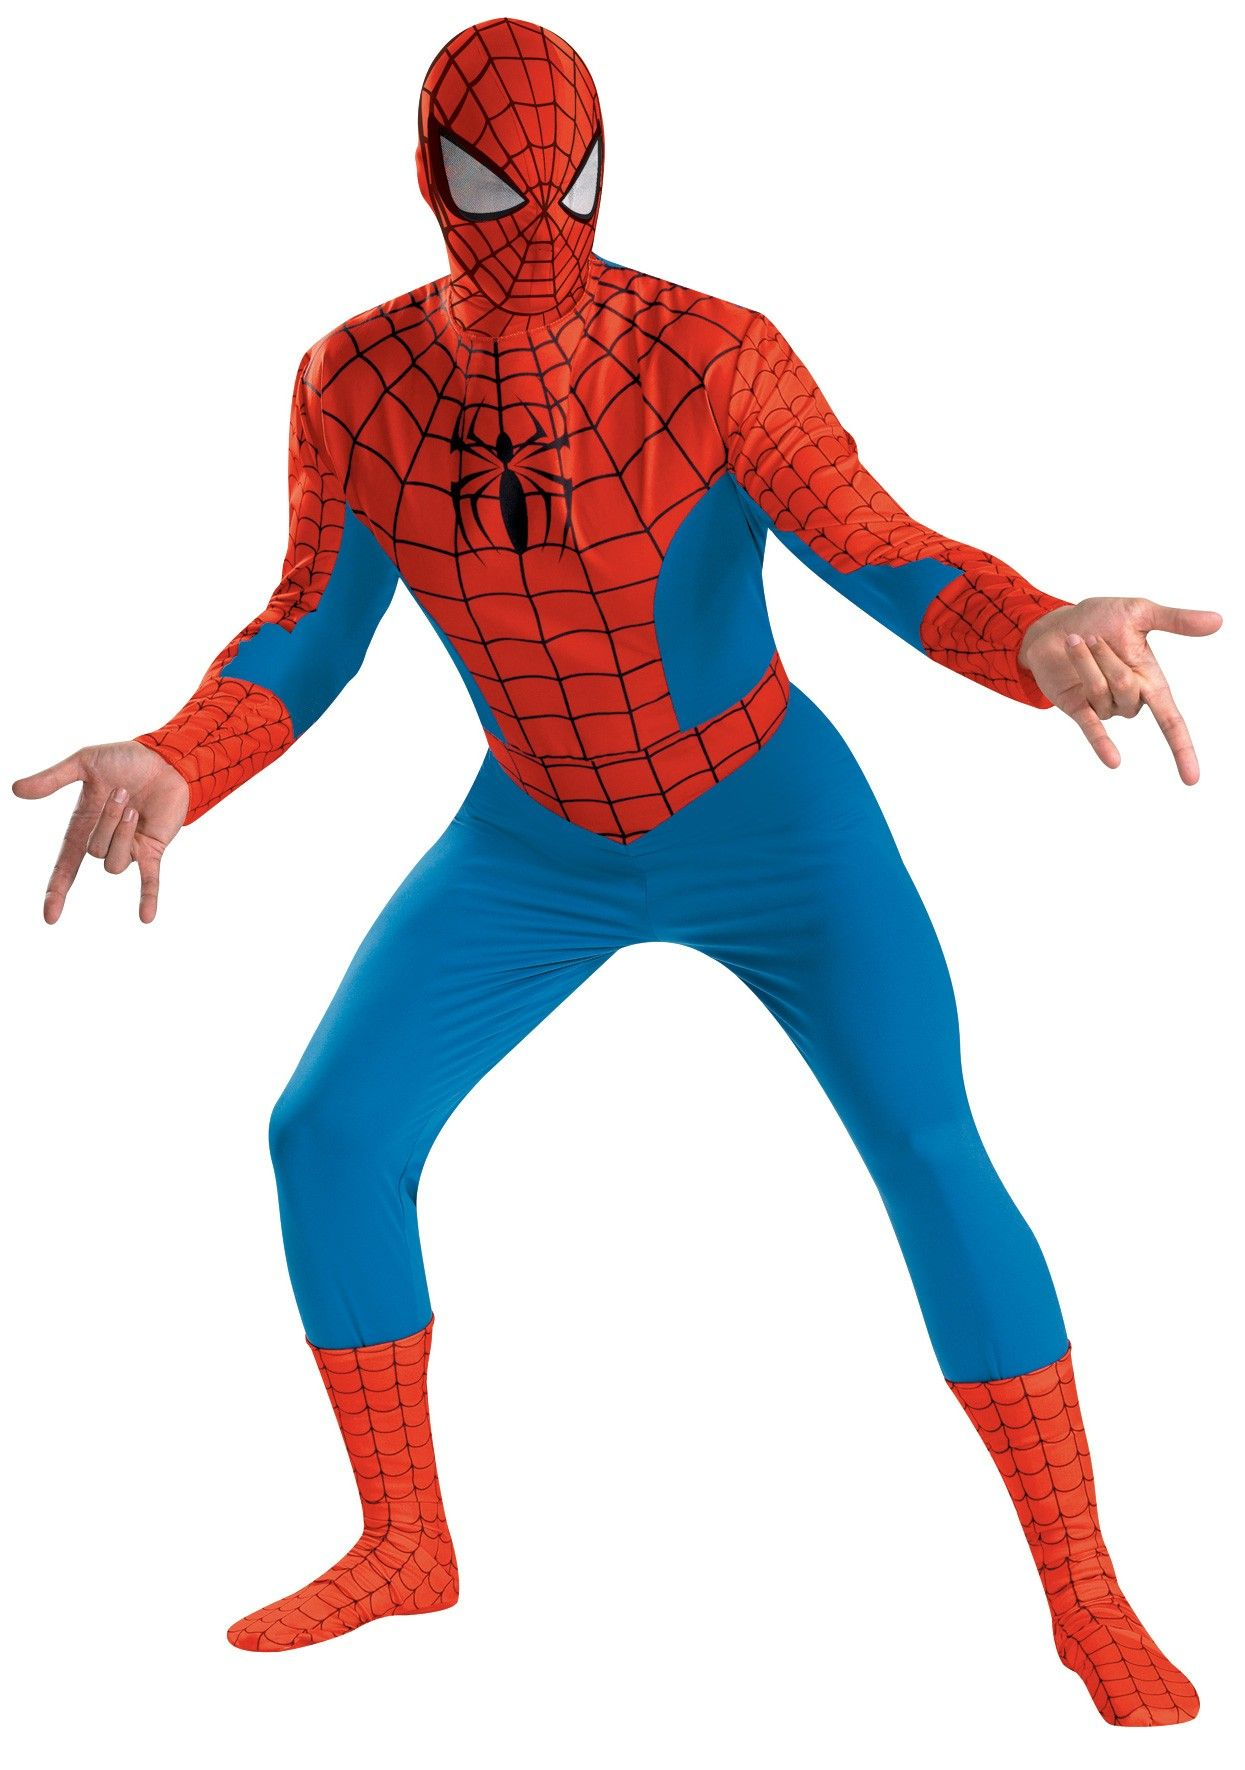 Spider-Man Deluxe Adult Costume | Costumes.com.au  sc 1 st  Pinterest & Spider-Man Deluxe Adult Costume XL | Pinterest | Spider-Man Spider ...